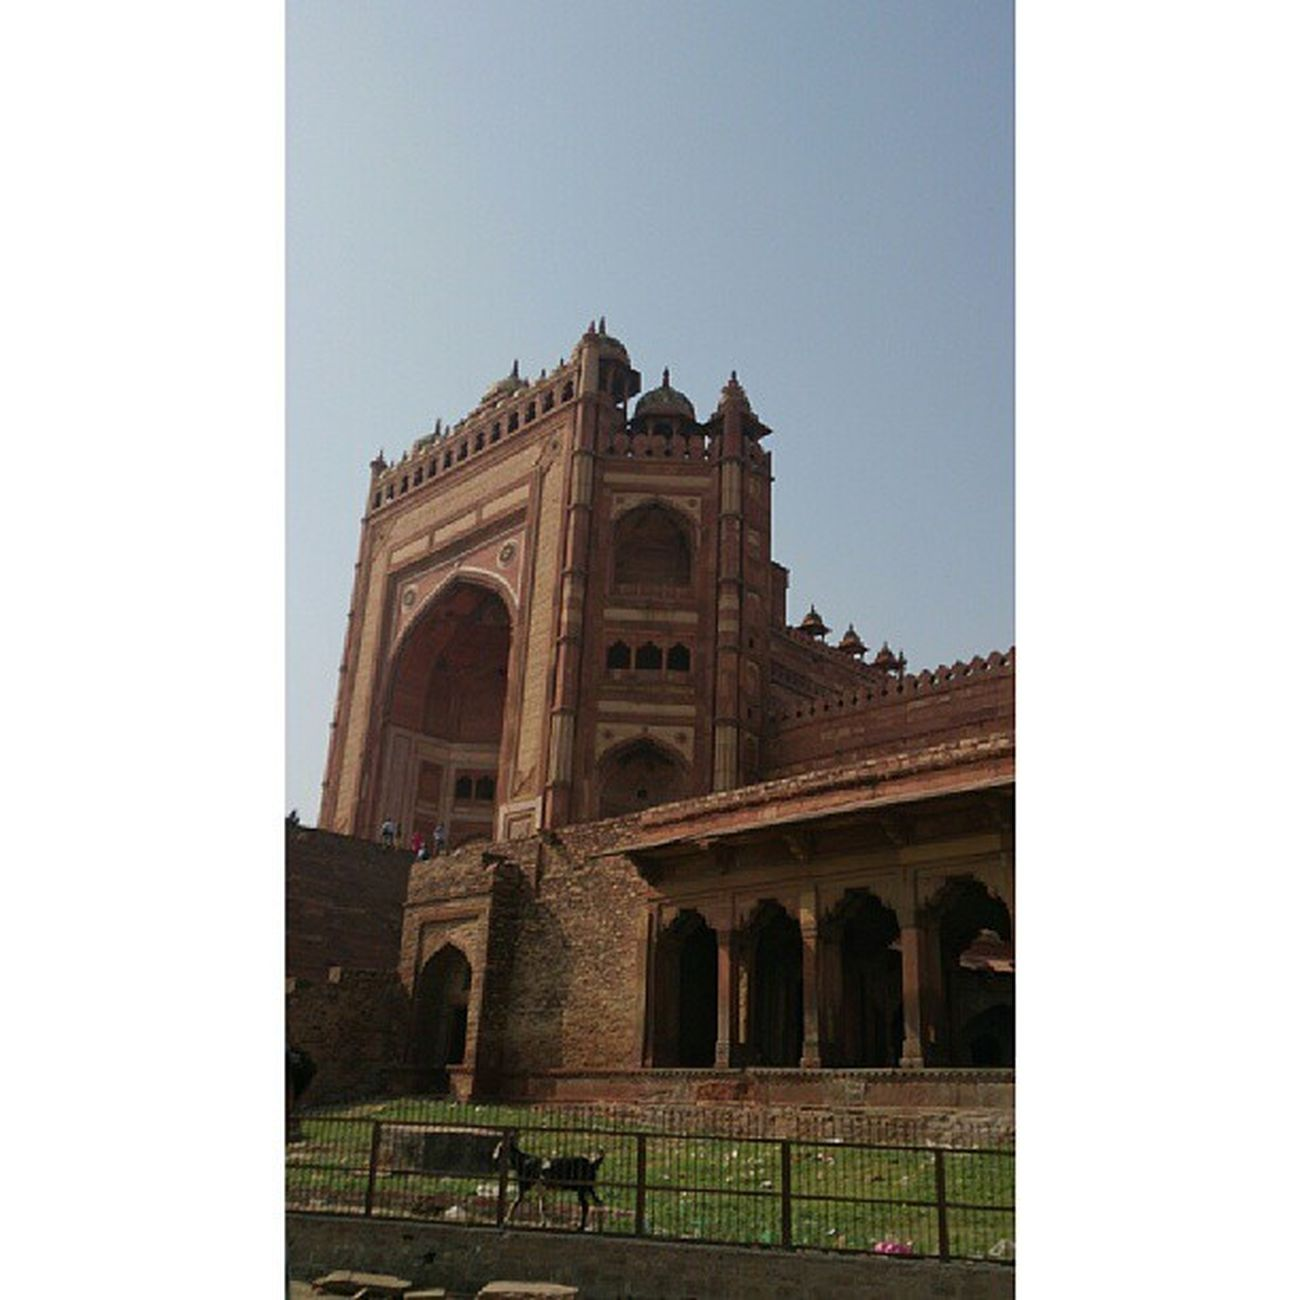 BulanddarwazaFatehpursikri Agra India Asias Longest Door Mughal History Victory Dargah People Faith Forts